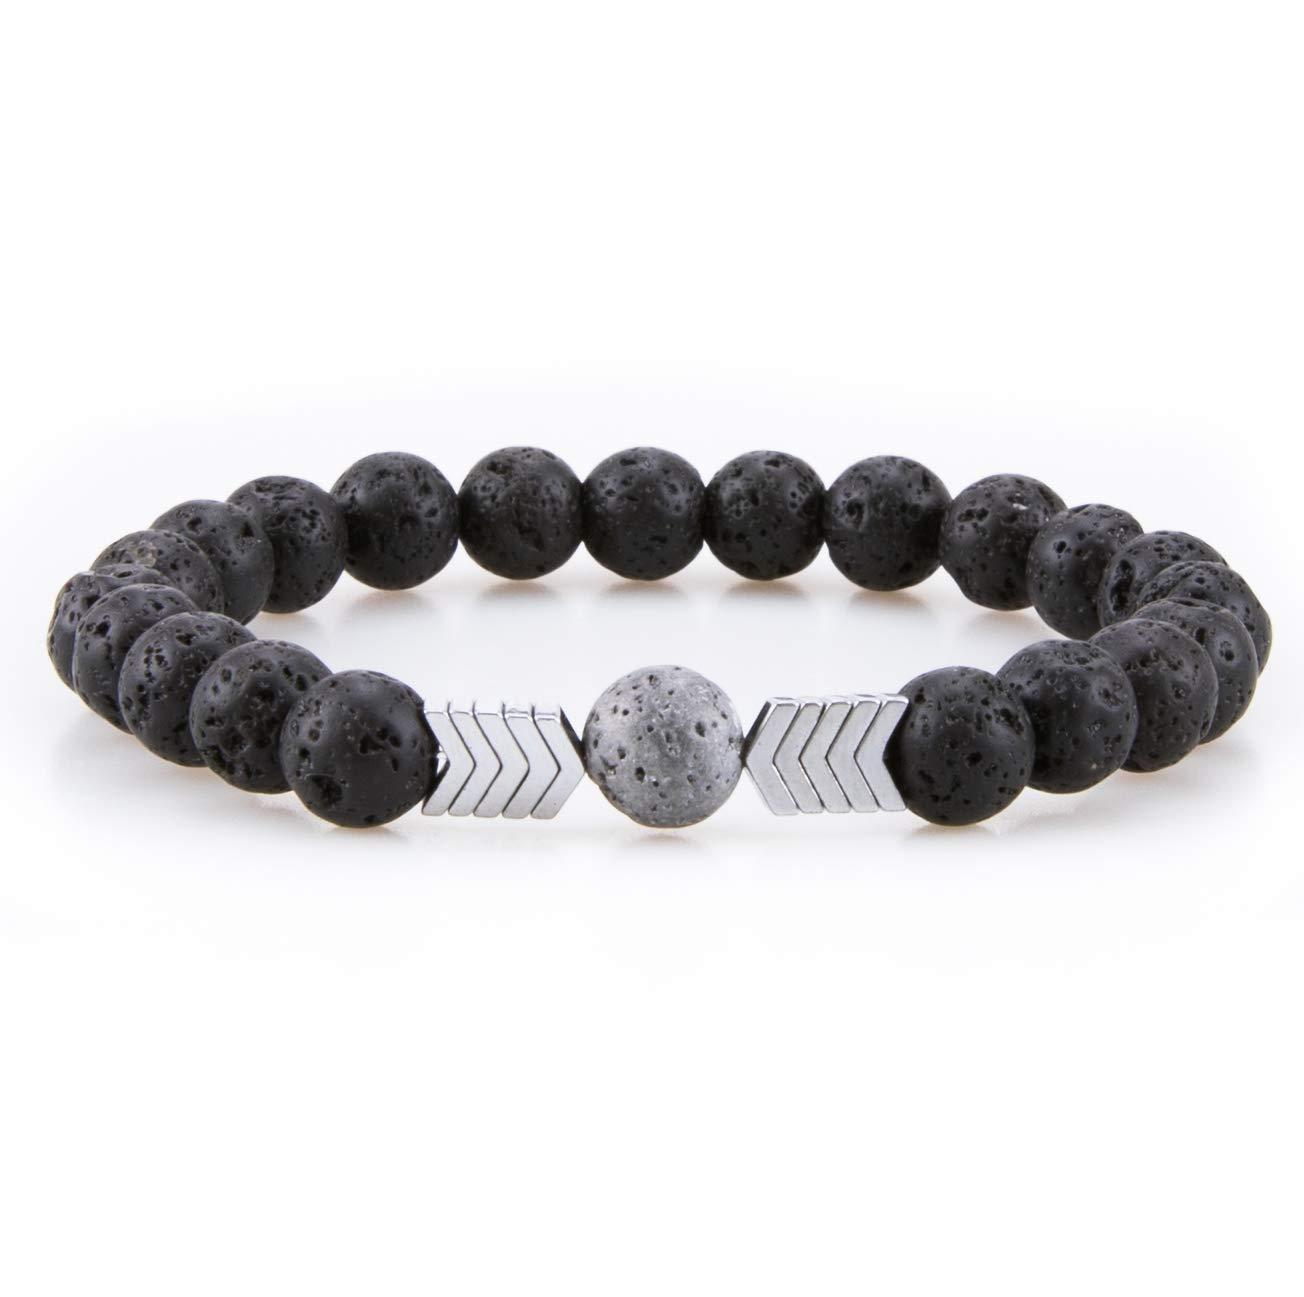 Bivei Lava Rock Stone Bead Hametite Therapy Arrow Aromatherapy Essential Oil Diffuser Bracelet anbivi11122059